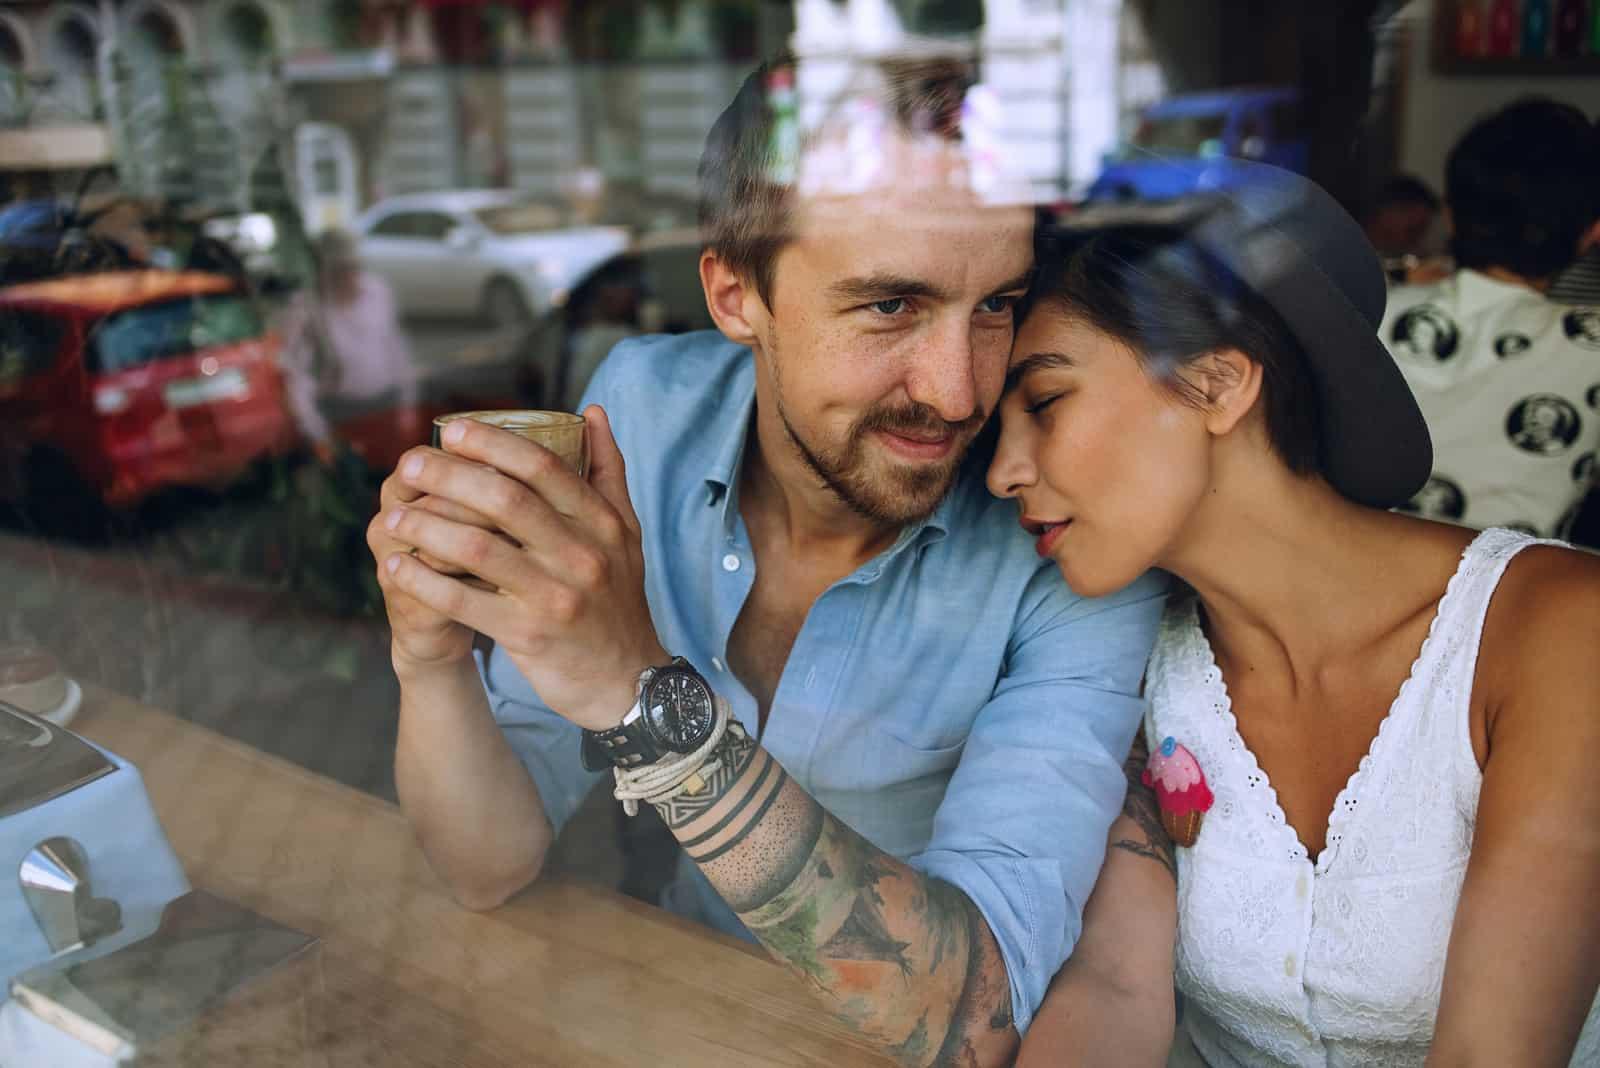 Verträumtes Paar, das sich am sonnigen Tag im Café hinter dem Fenster ausruht?